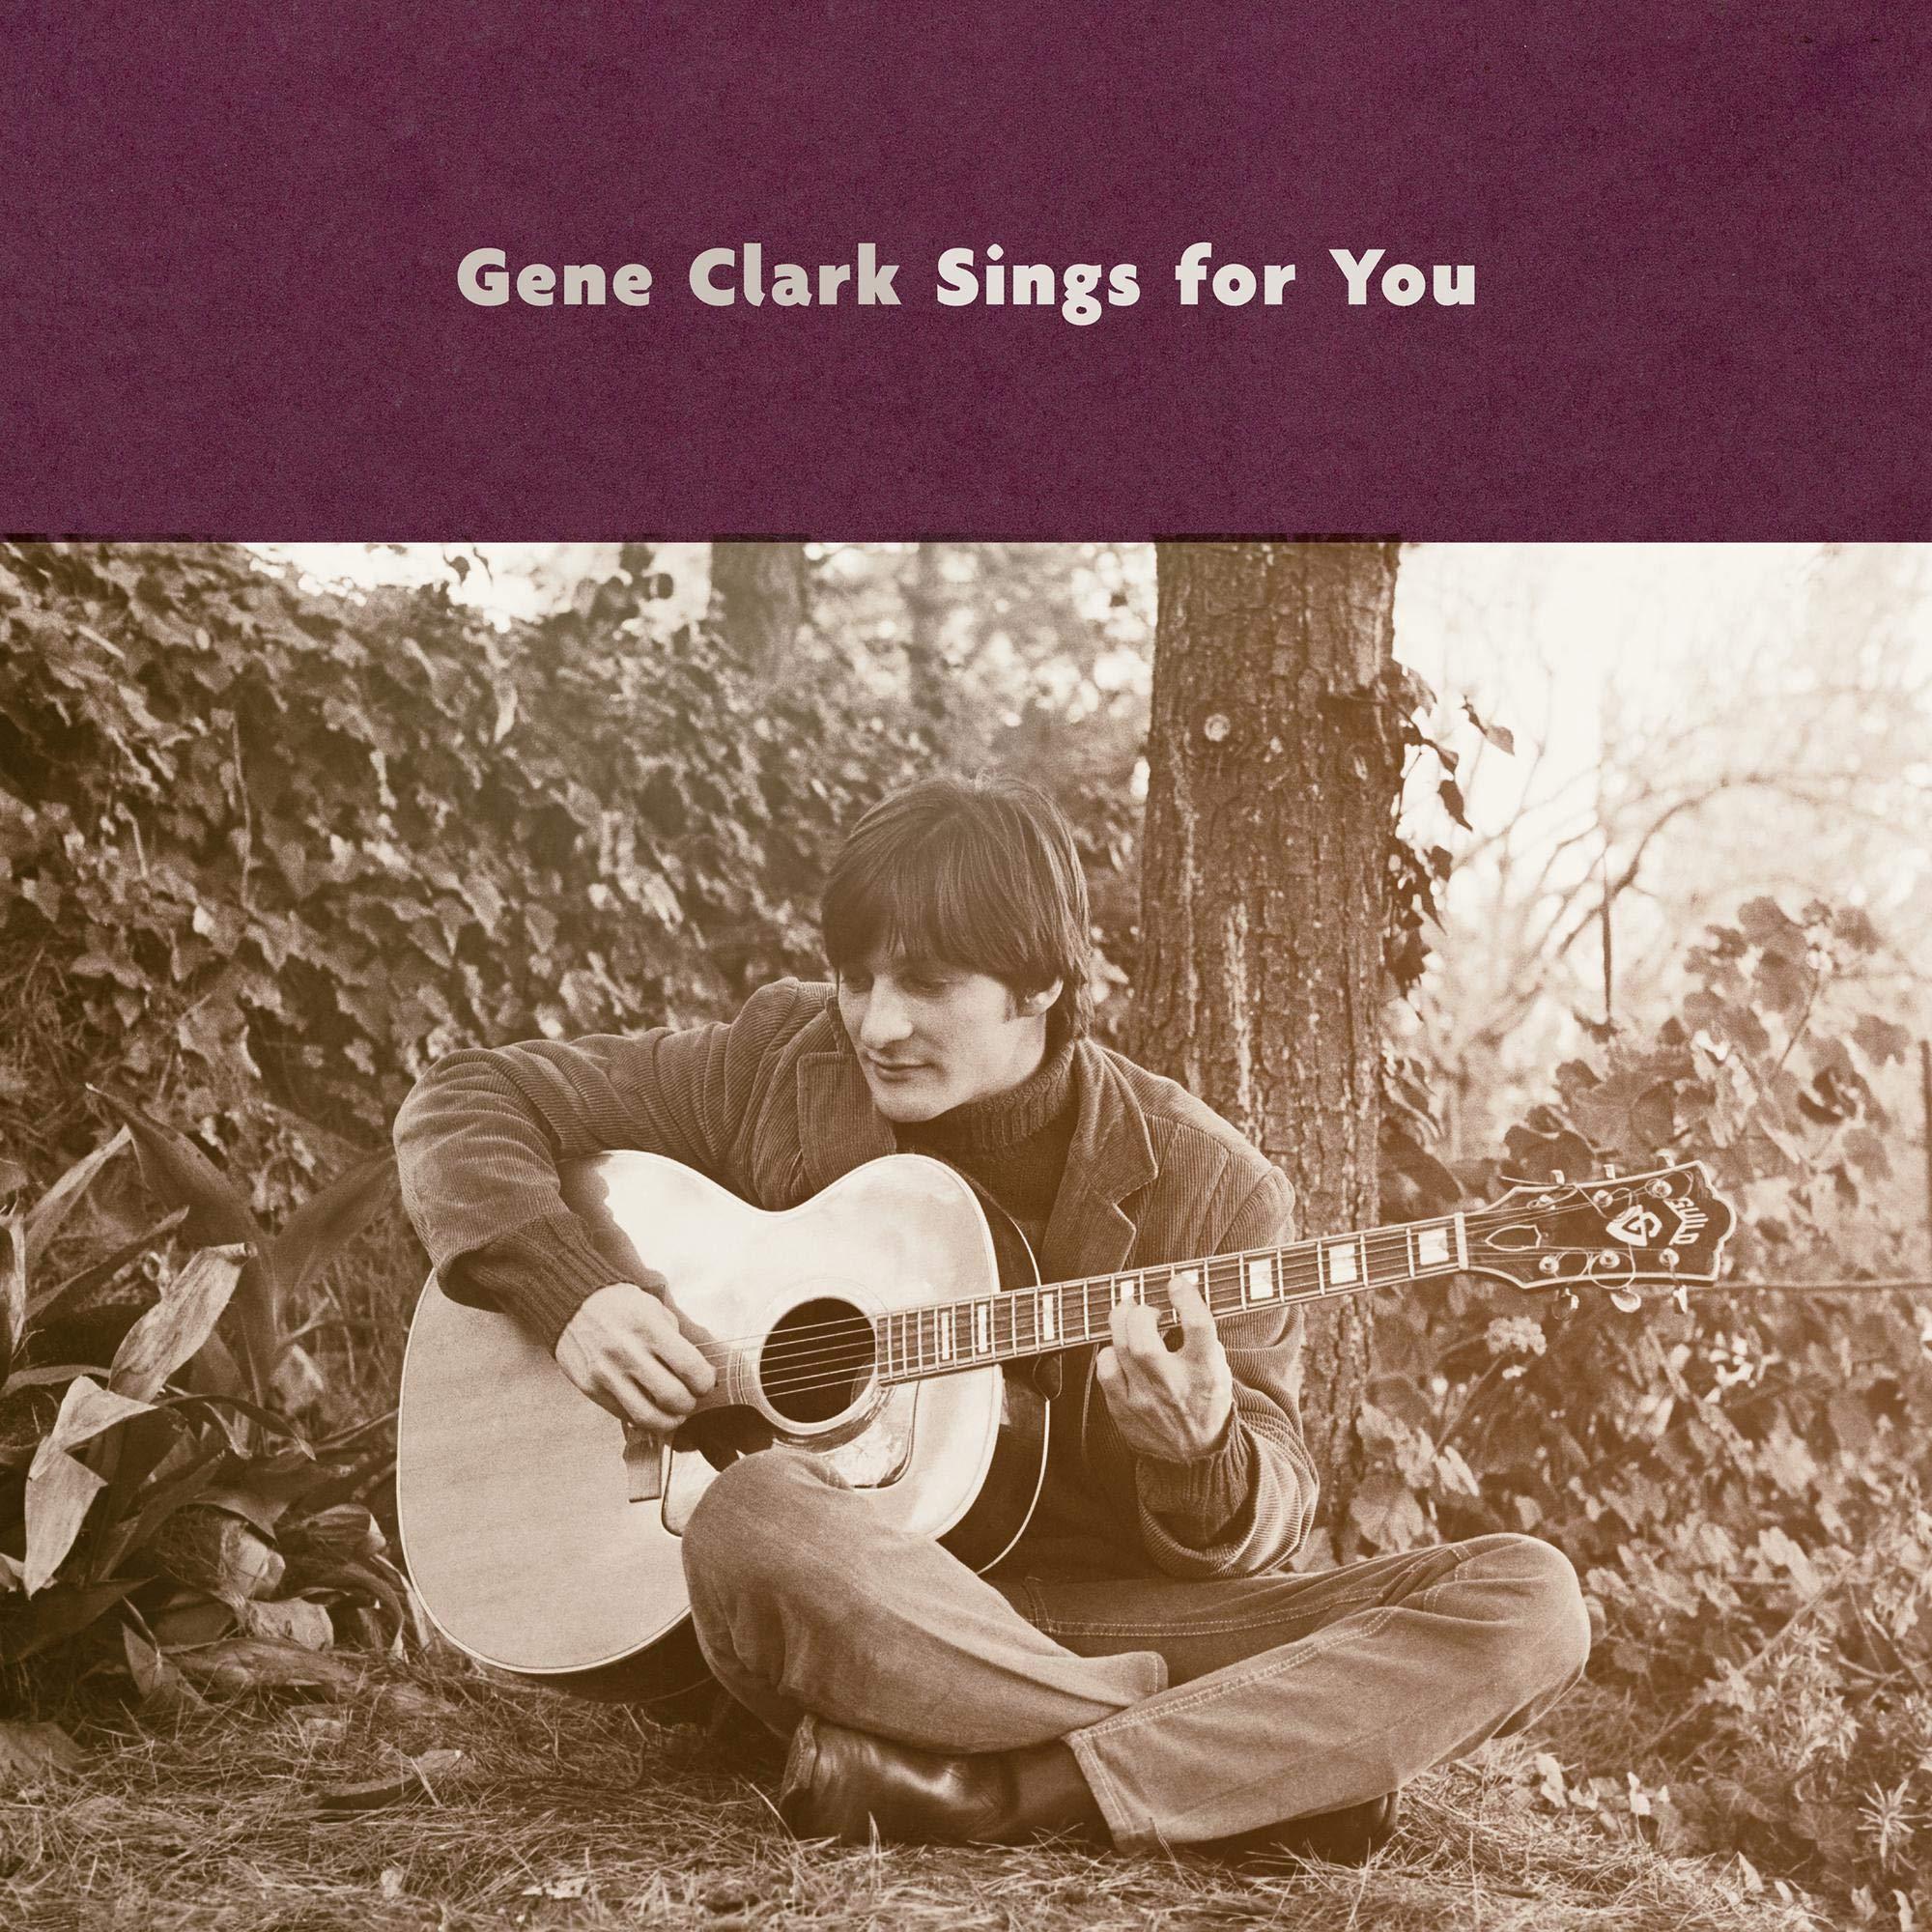 Gene Clark - Gene Clark Sings For You (2018) [FLAC] Download